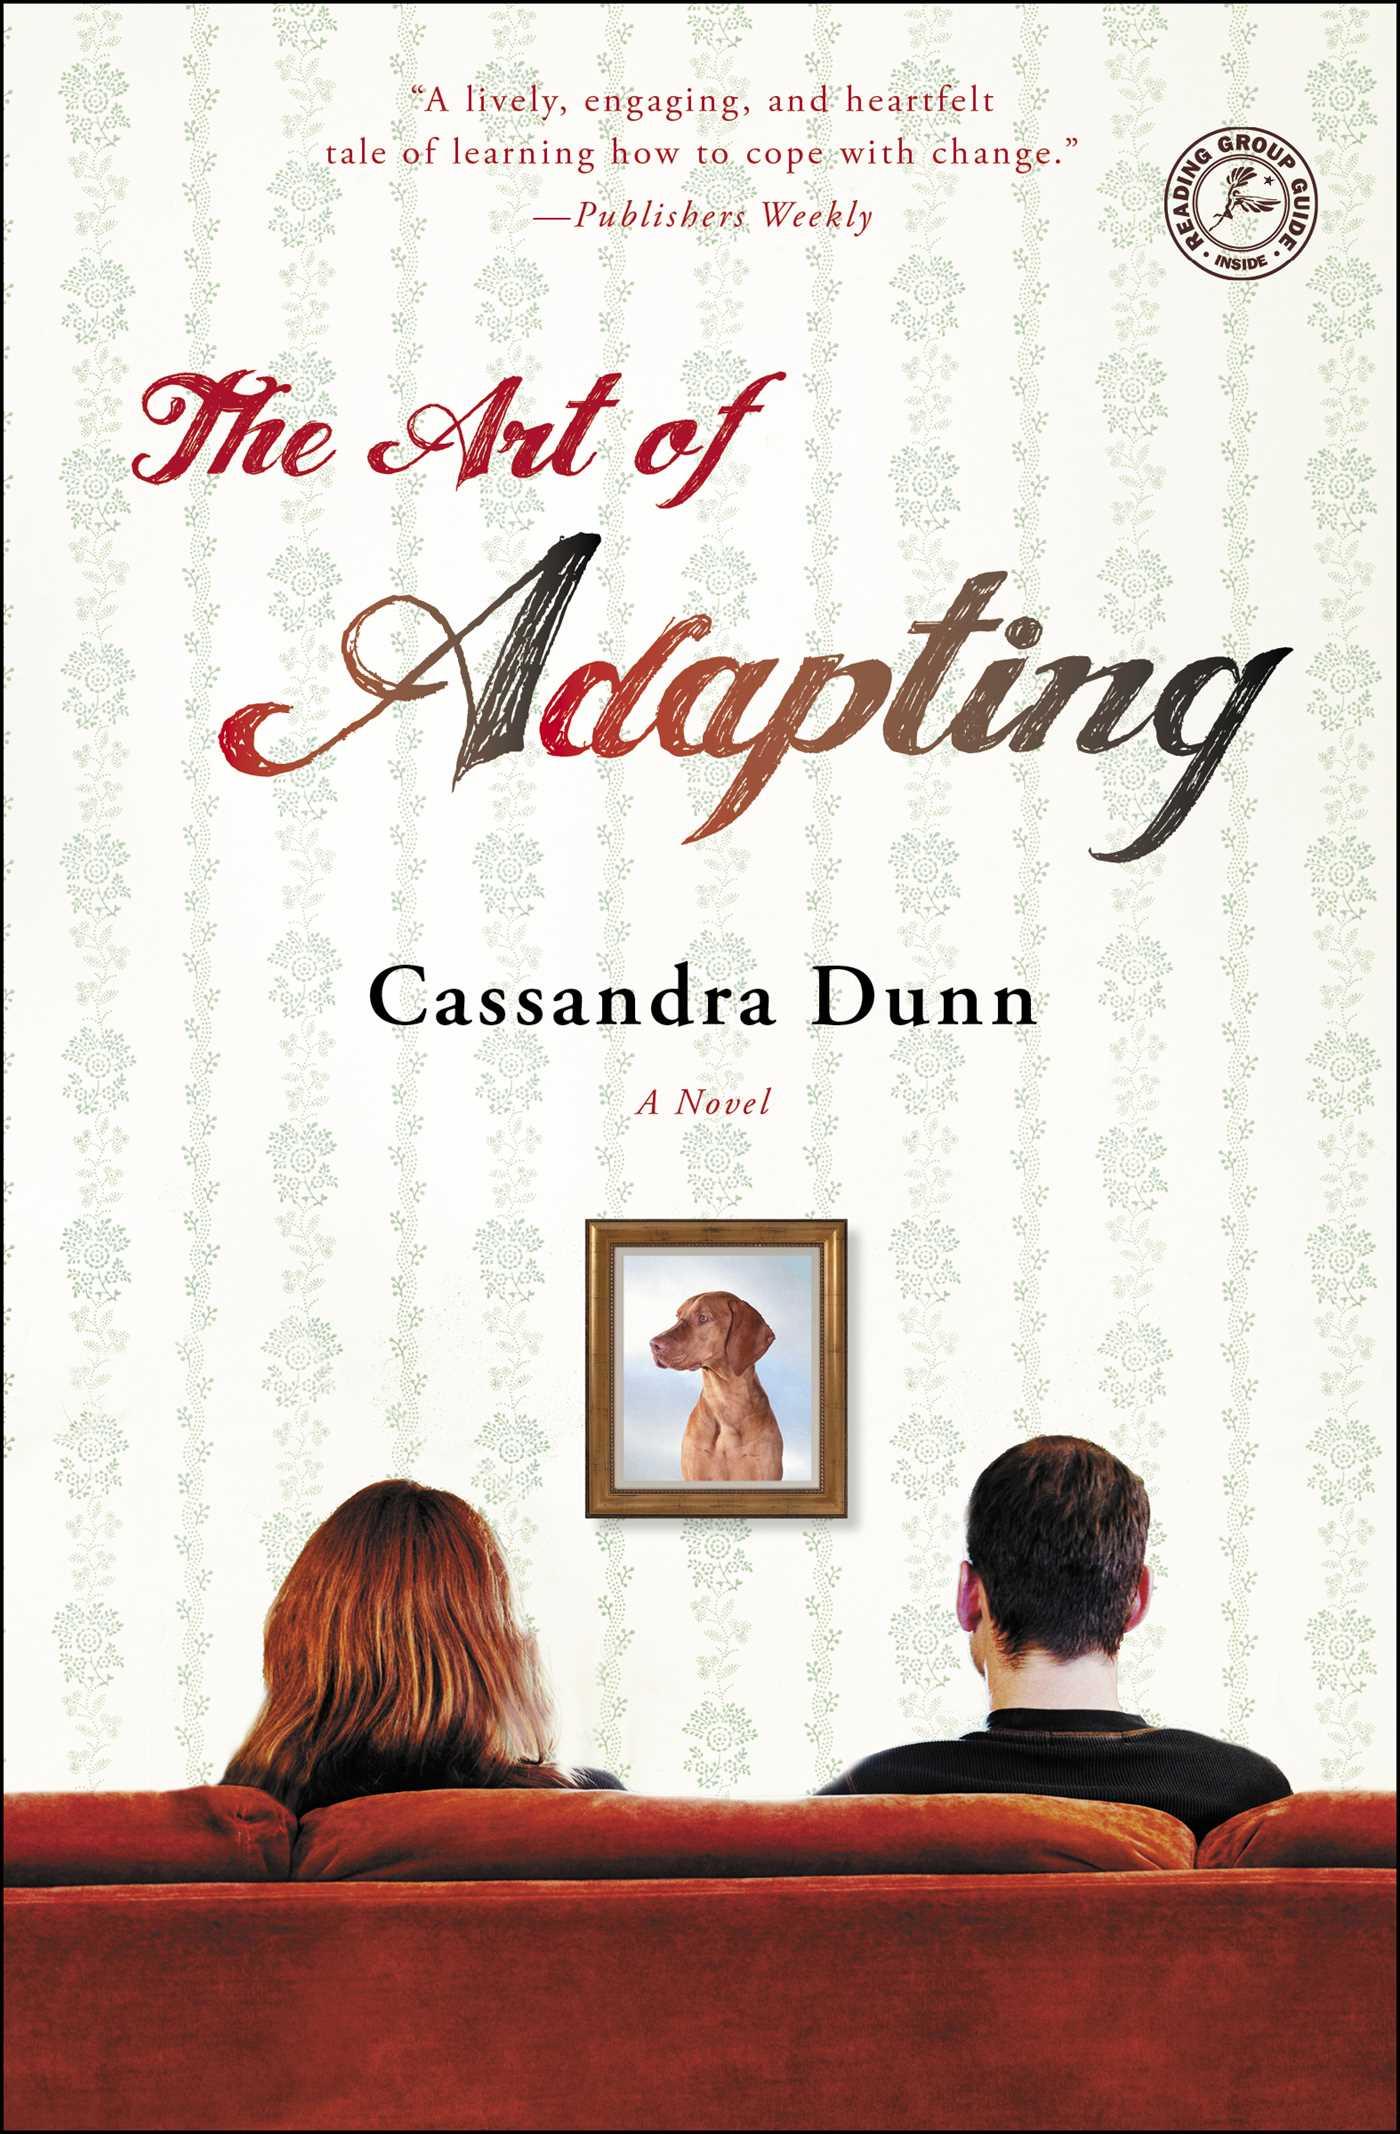 The Art of Adapting